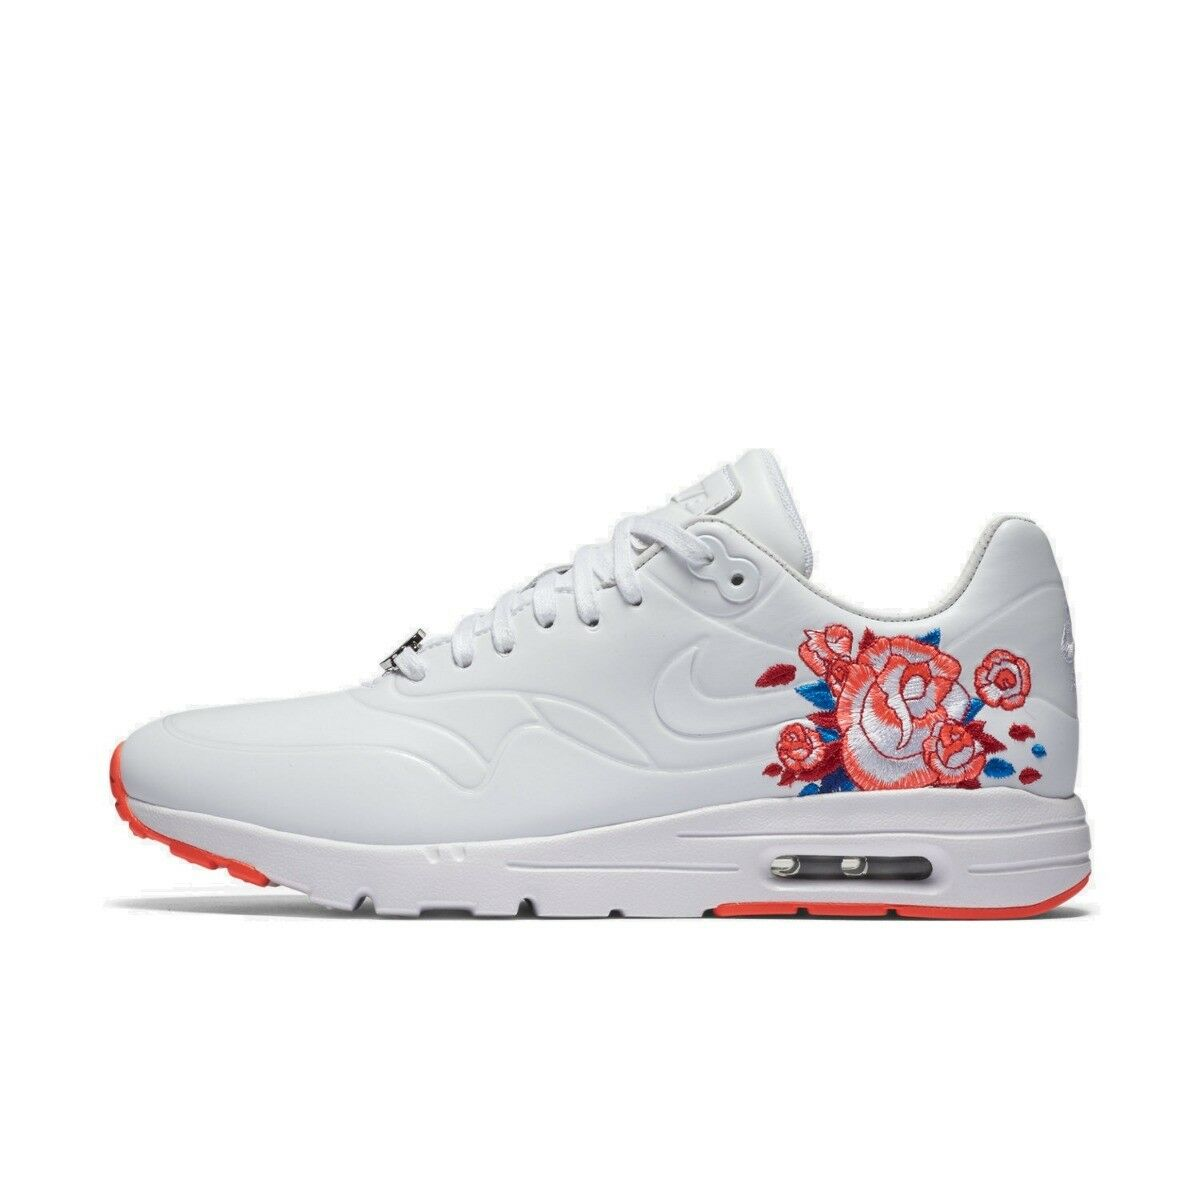 Nike Femmes AIR MAX ULTRA SW Qs Taille rose blanc de Course Baskets RARE